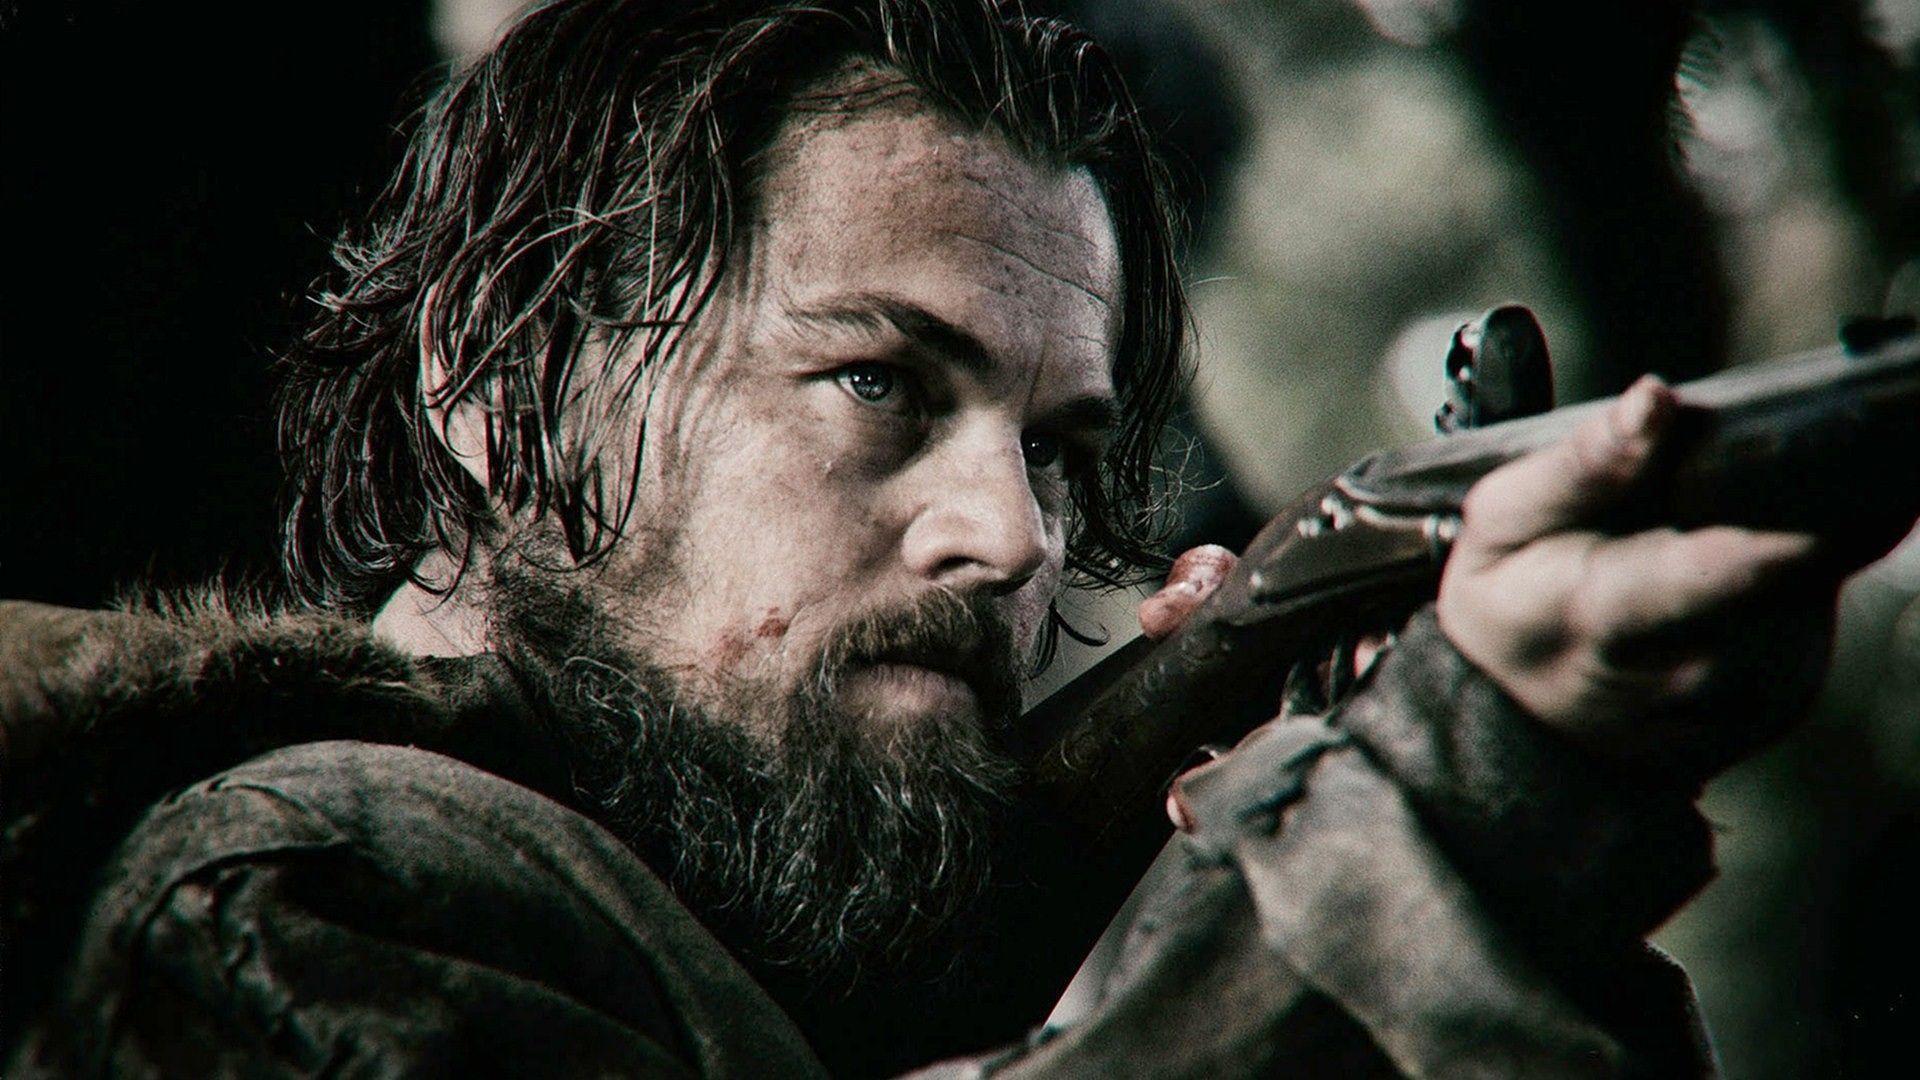 Leonardo di Caprio Revenant